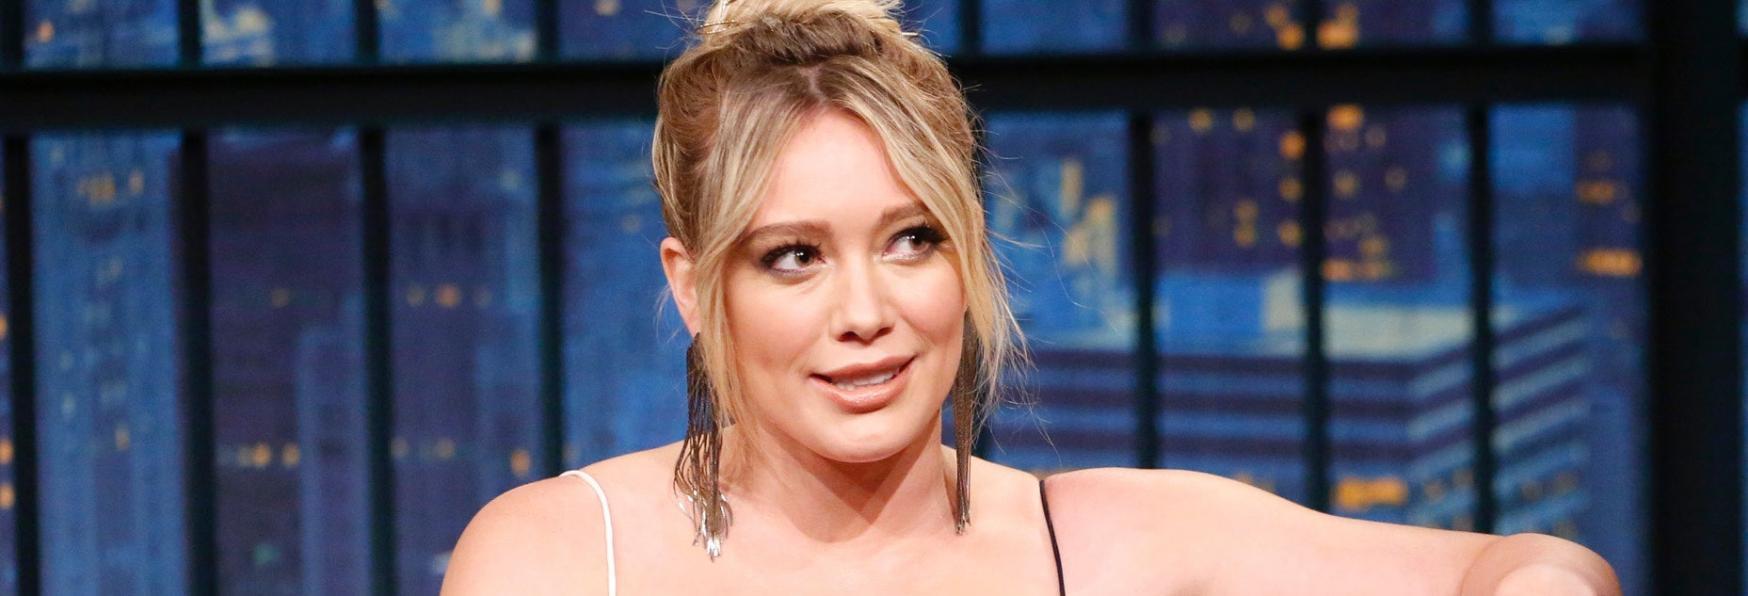 How I Met Your Mother: Hilary Duff pubblica una Foto dal Set della Serie TV Spin-off